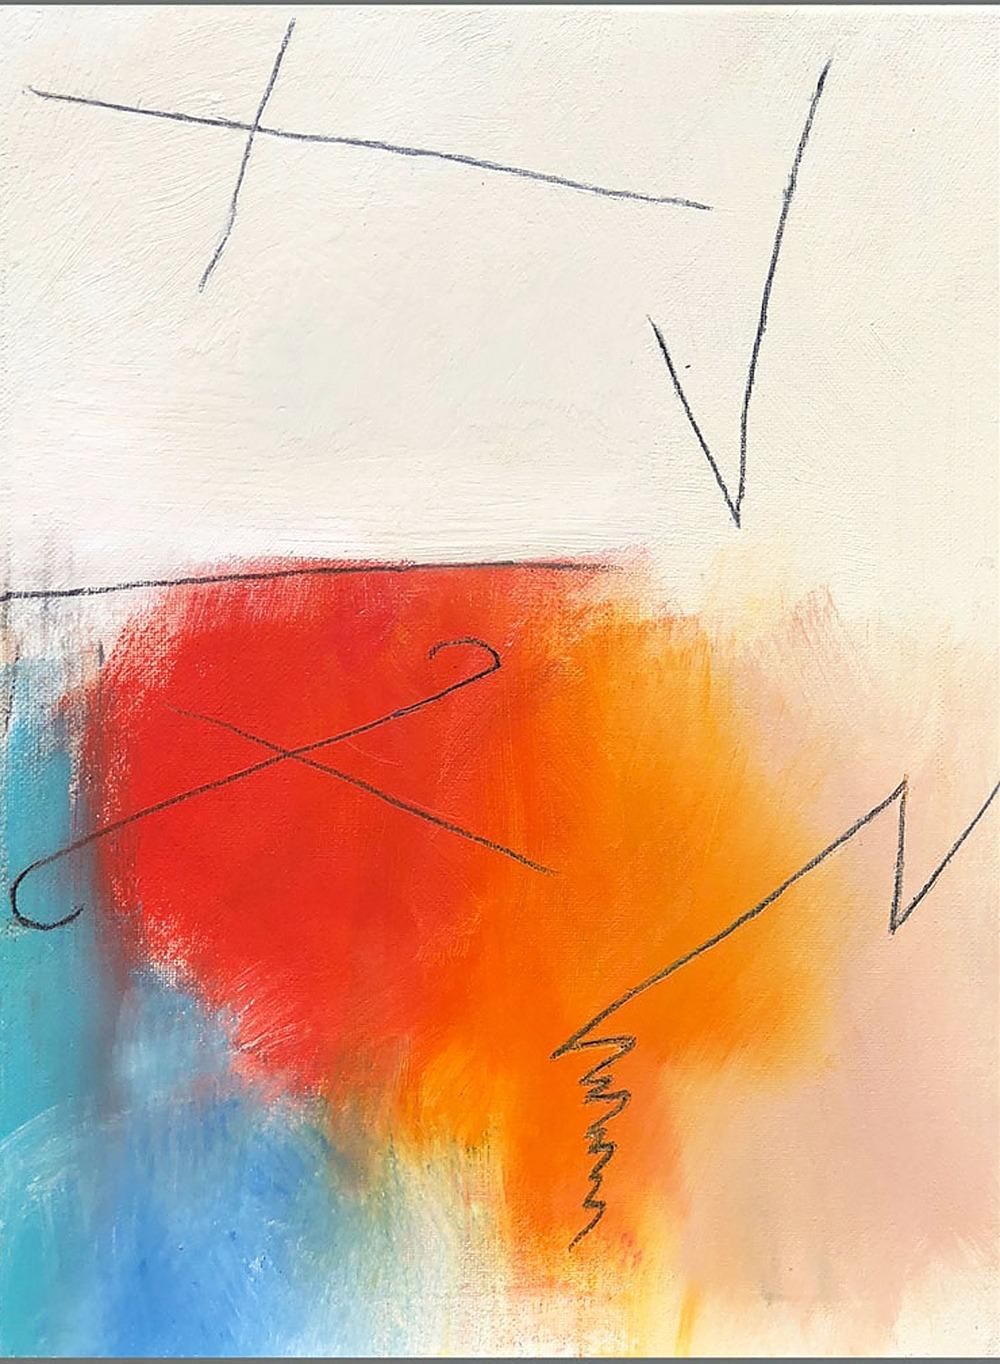 It's Personal by Judy Hintz Cox | ArtworkNetwork.com